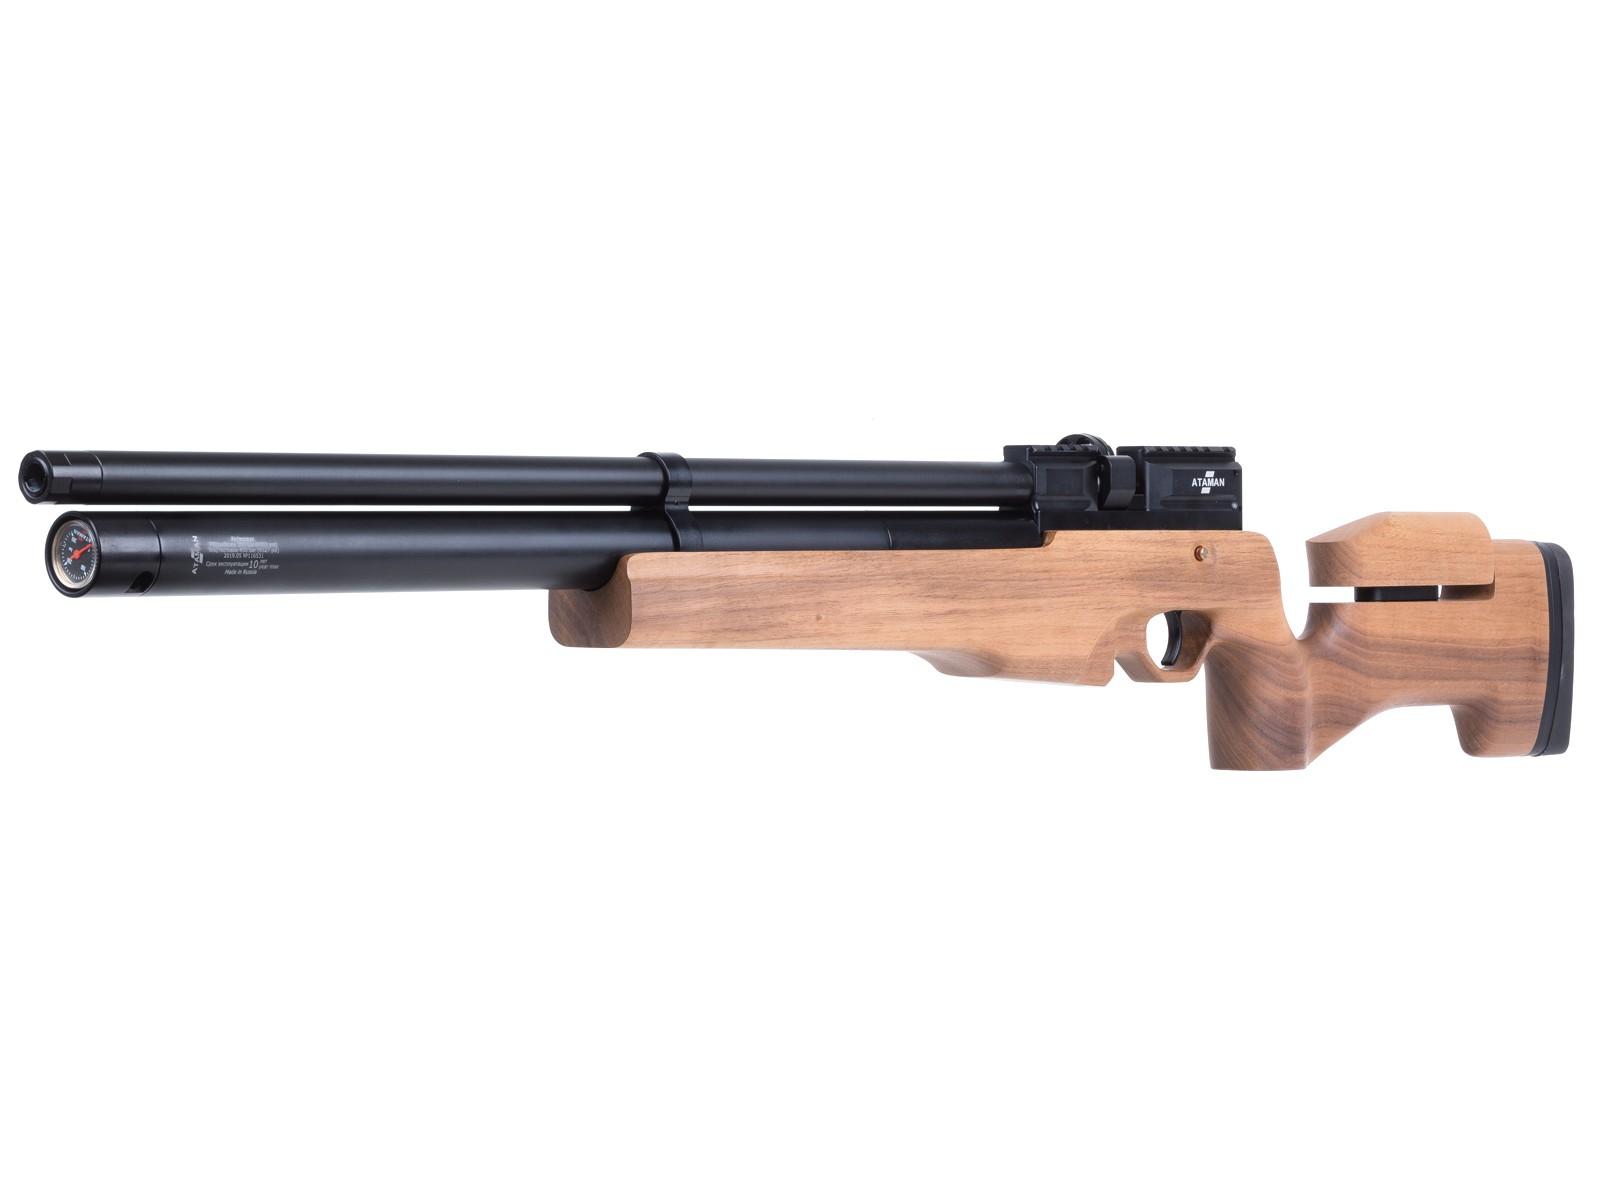 Ataman M2R Tact Carbine Type 1 Air Rifle, Walnut 0.357 thumbnail